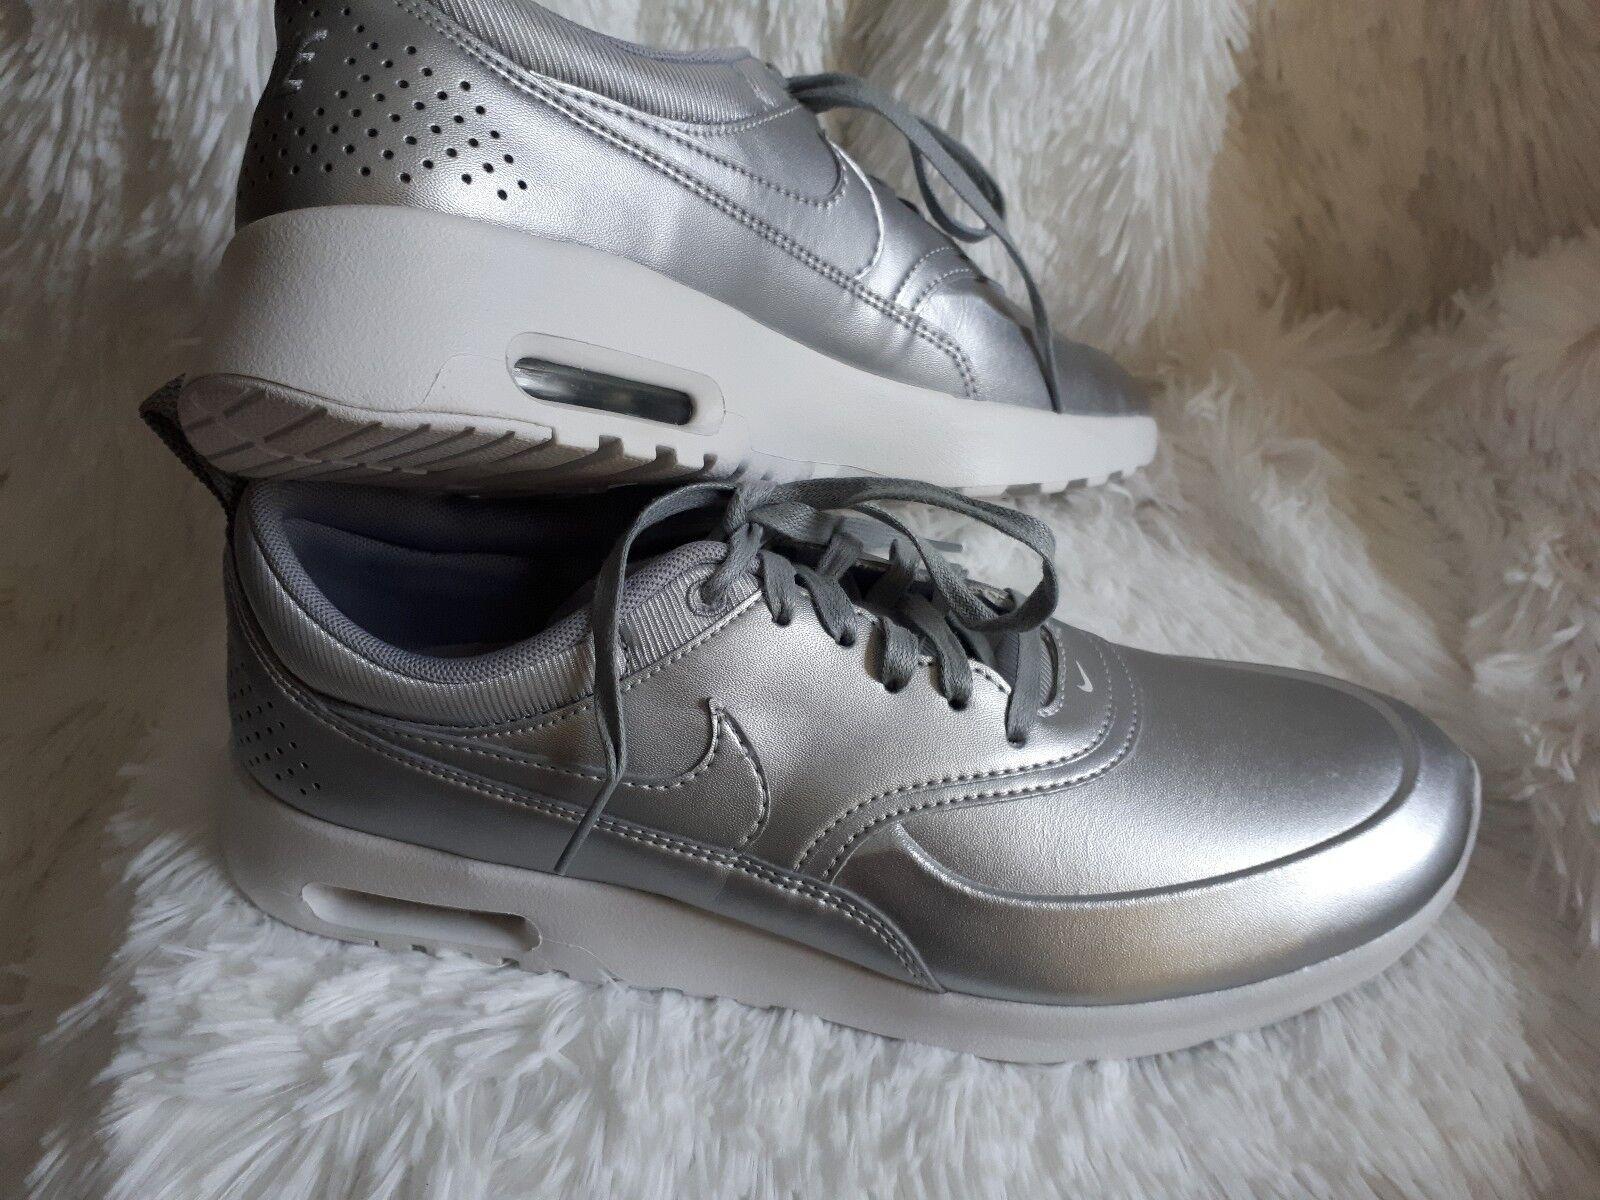 Nike Air Max Thea Damenss metallic silver sneakers Größe 10.5